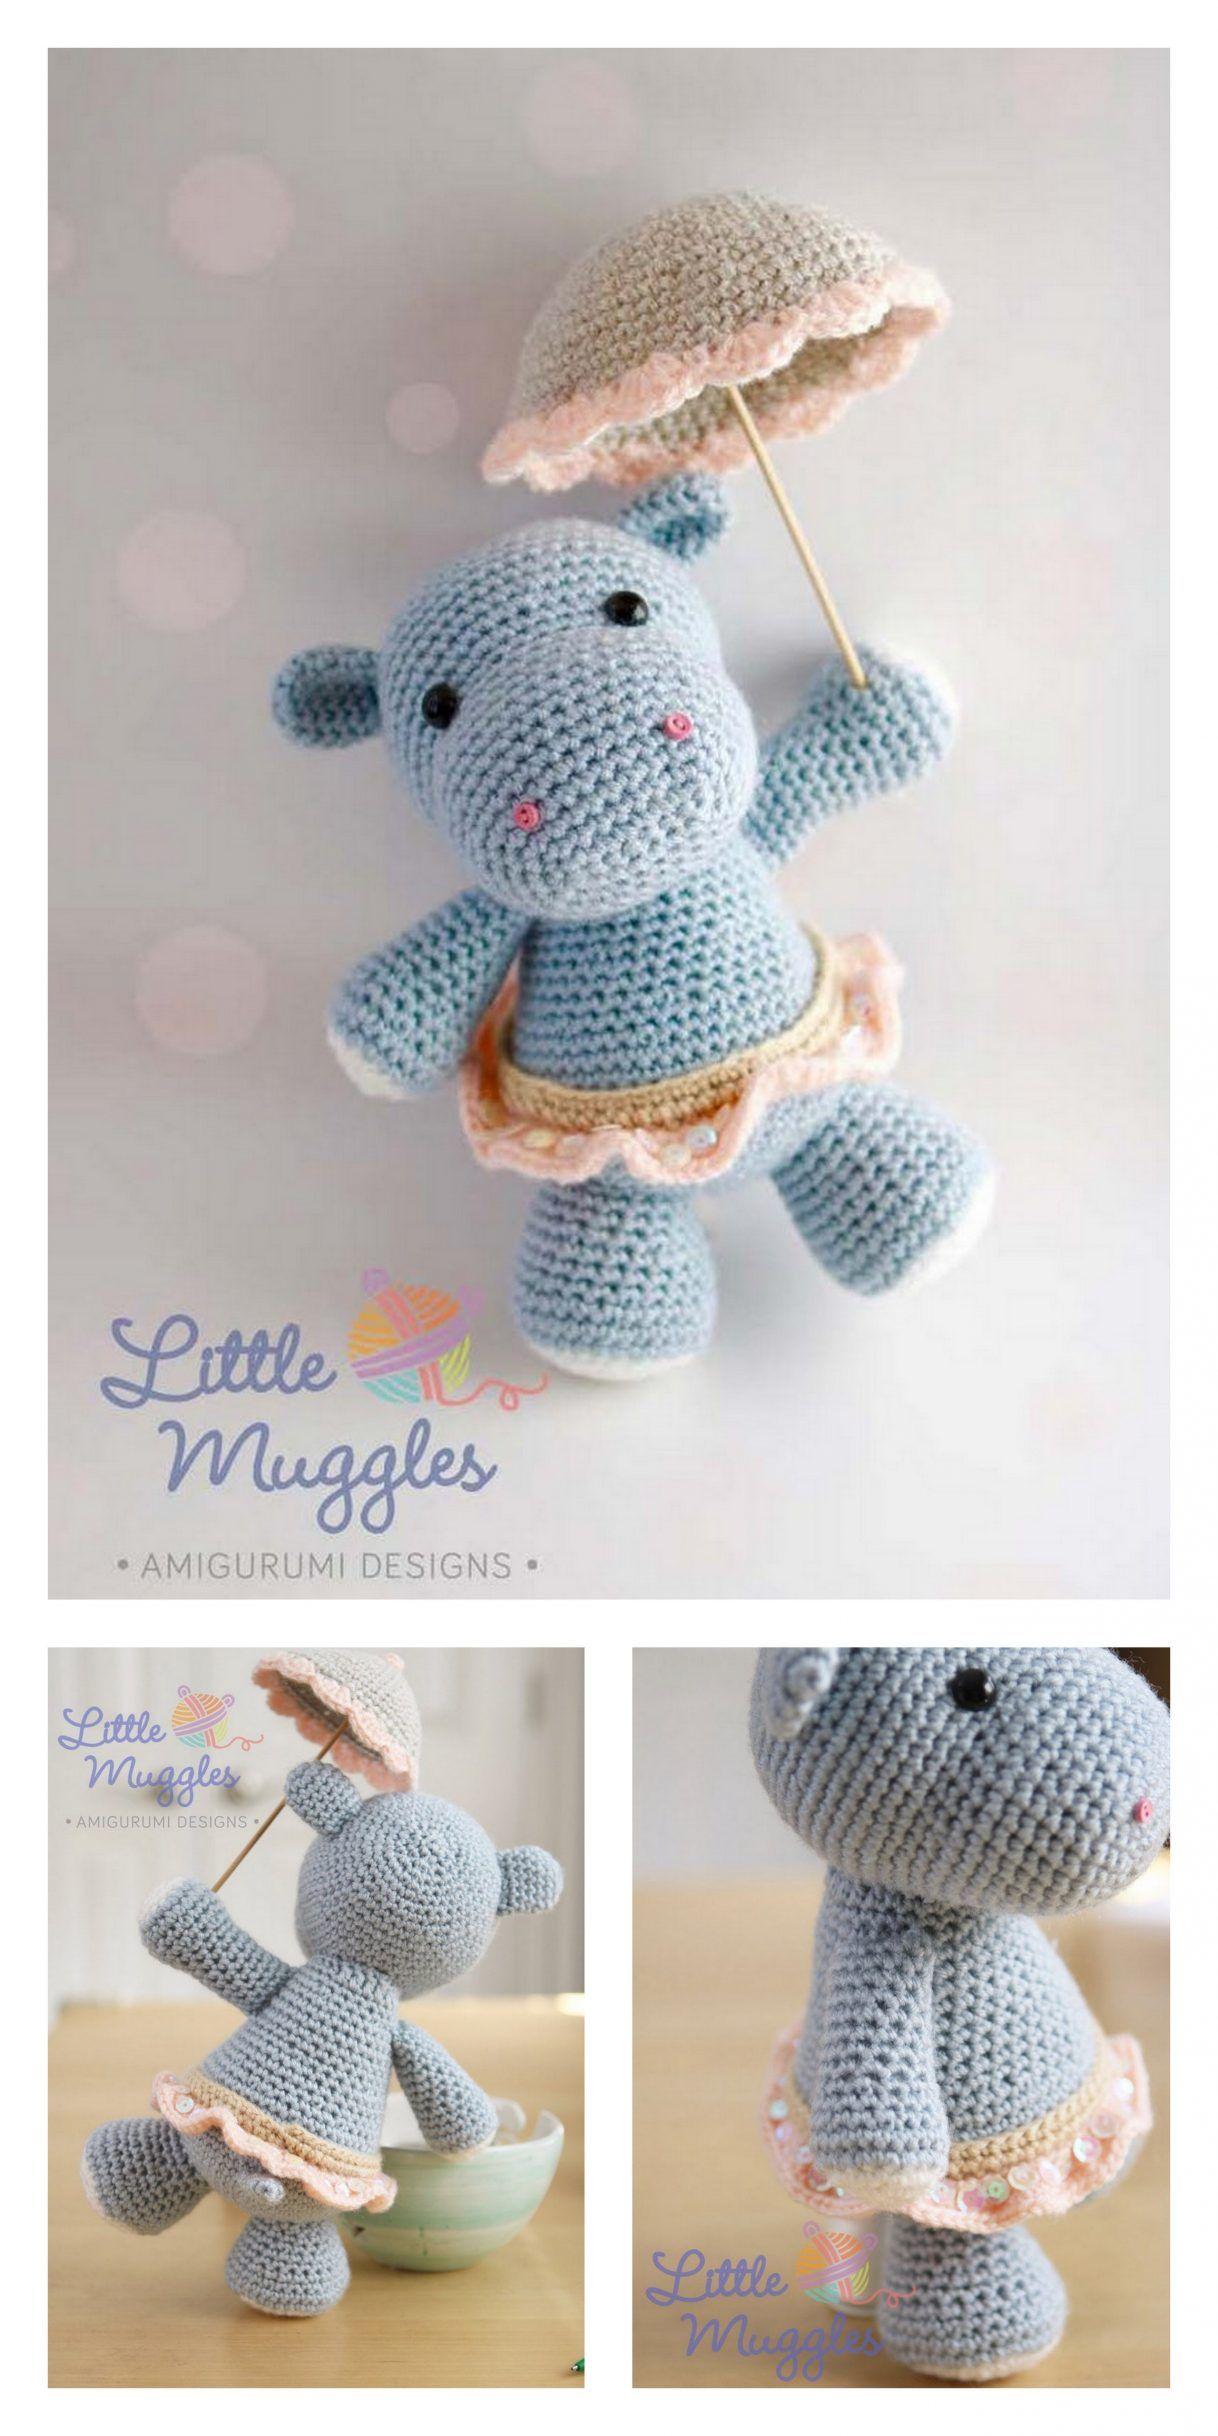 Pink hippo with dress amigurumi pattern (1) - free cross stitch ... | 2436x1218